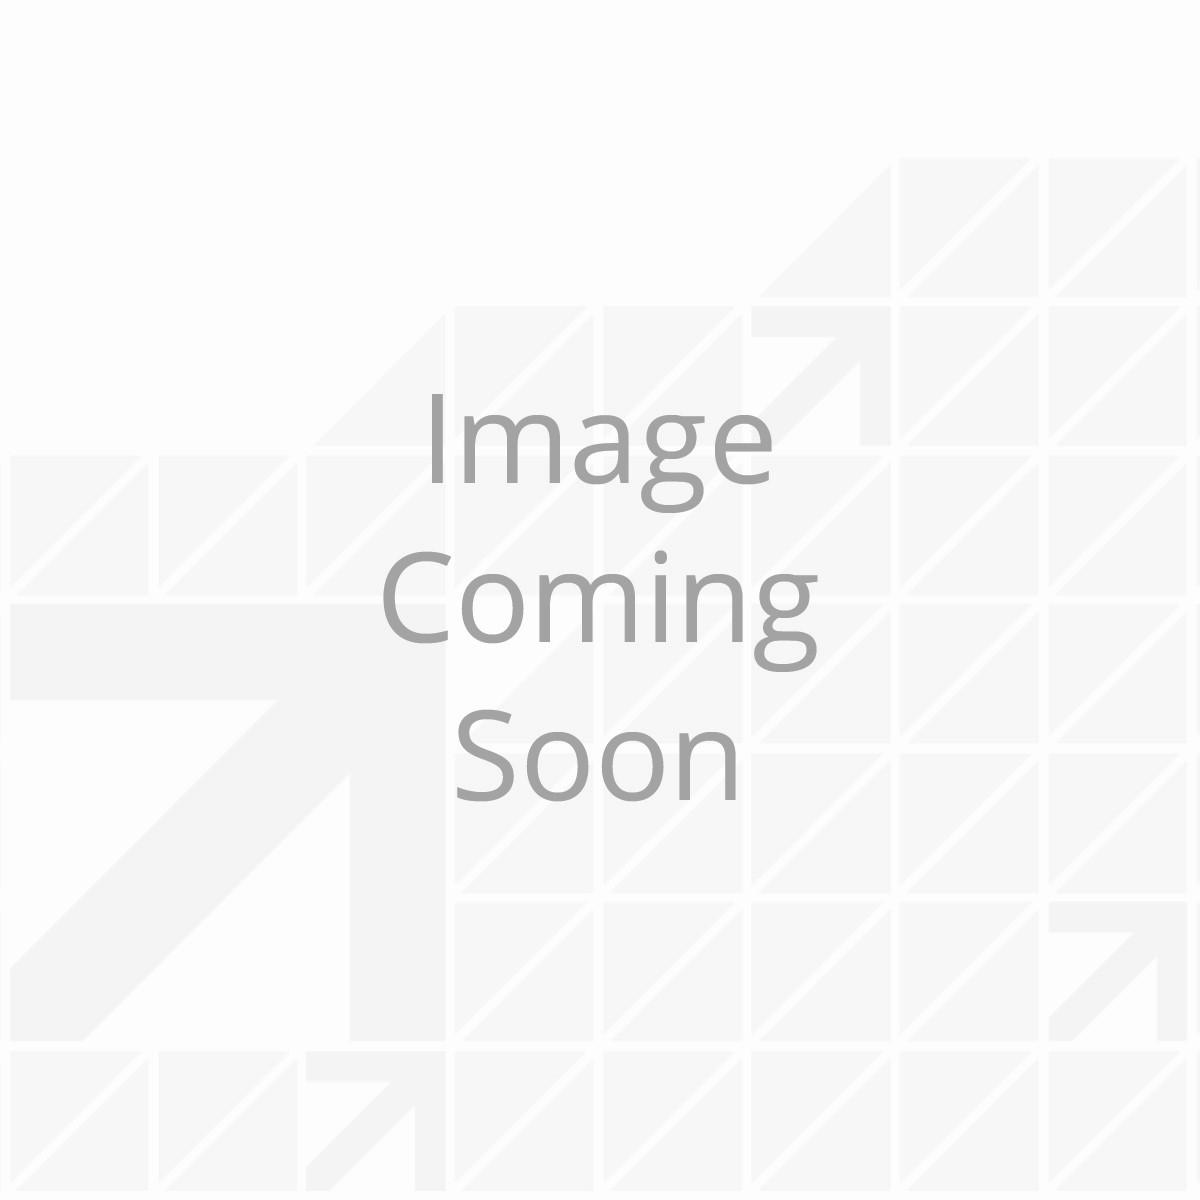 Equa-Flex® Rubberized Equalizer - Triple Axle Kit, 3,000 to 6,000 lbs.